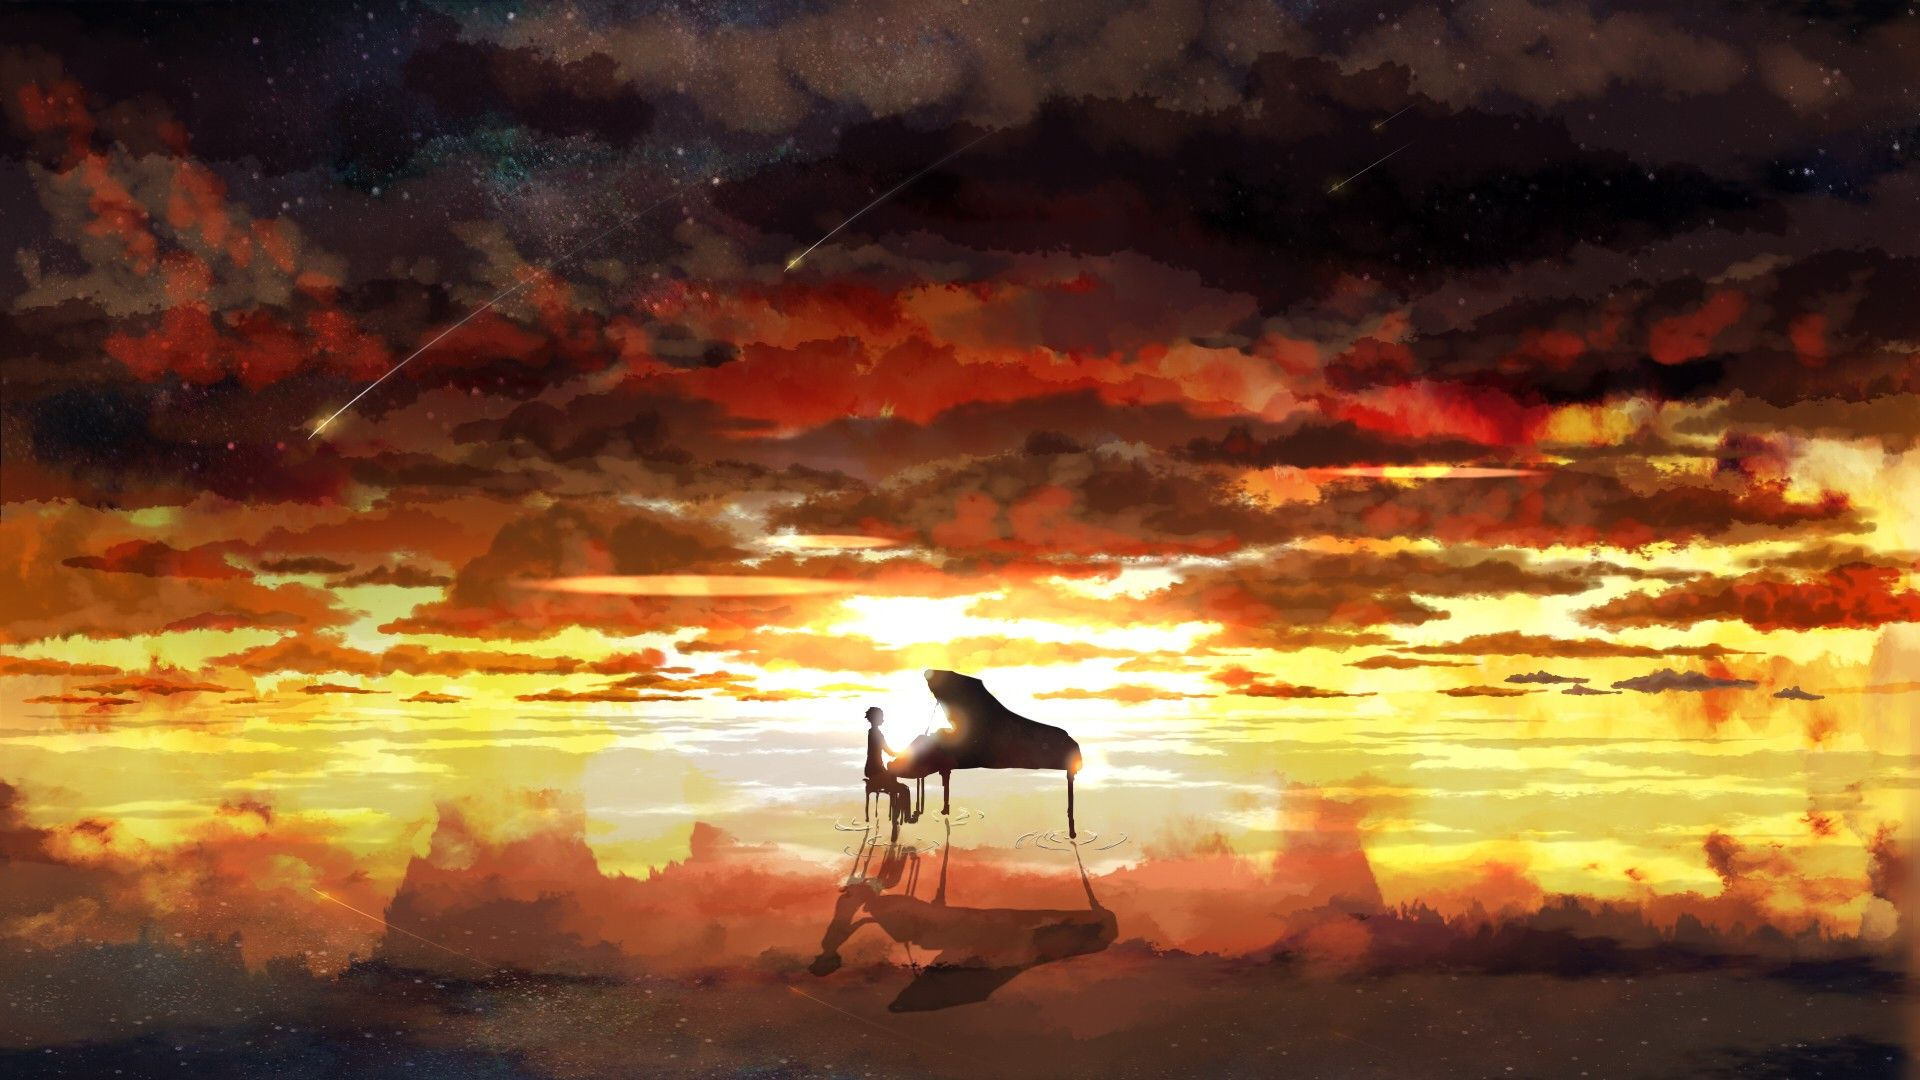 Piano Rising Sun Anime Wallpaper Check More At Hdwallpaperfx